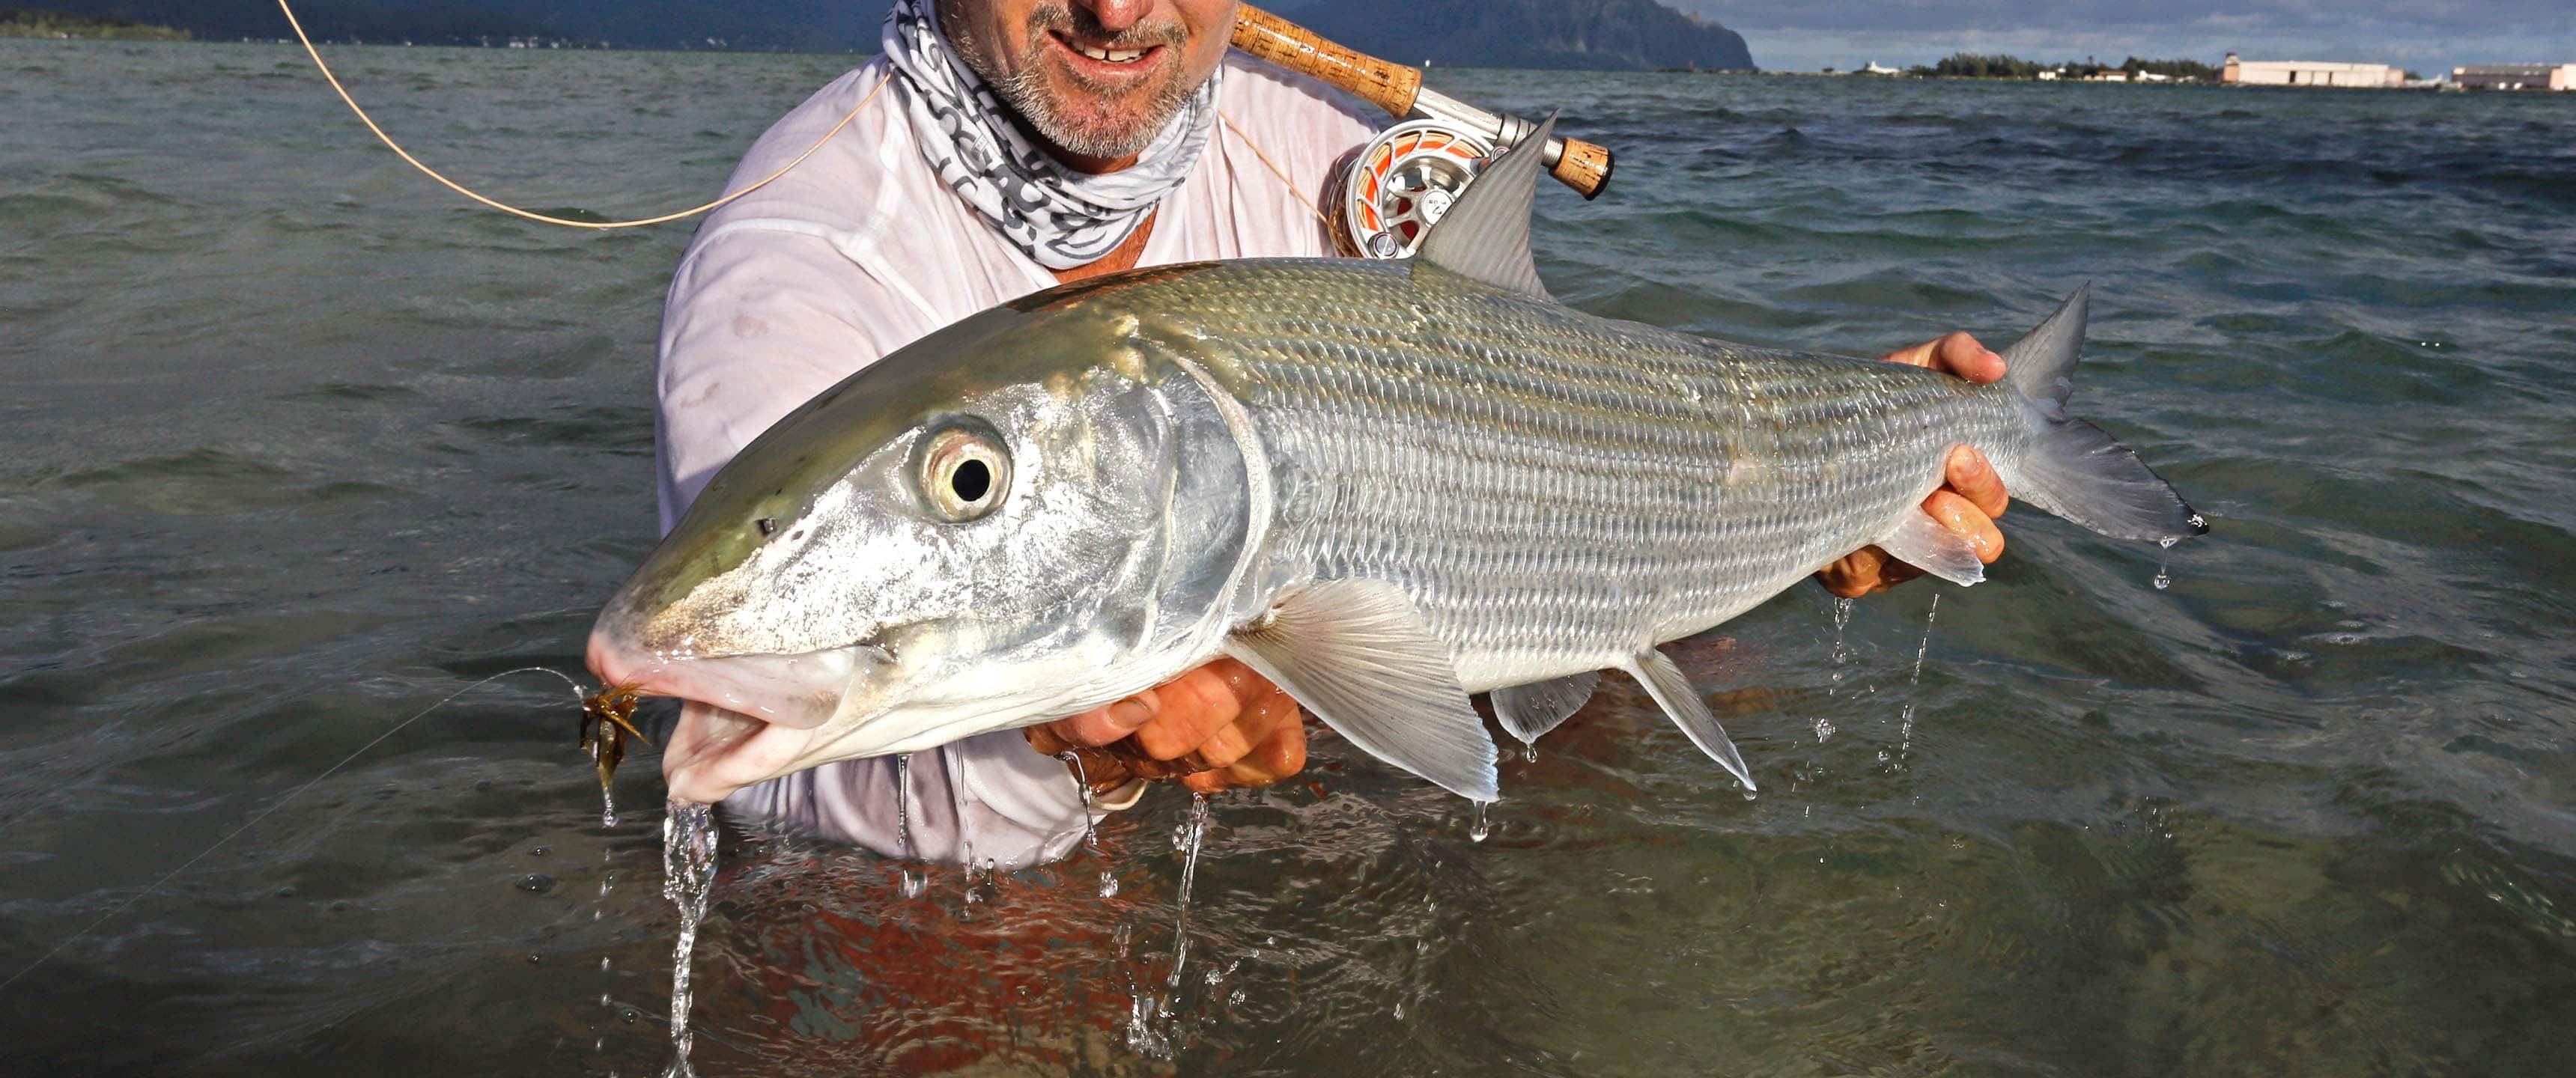 Hawaii fly fishing guide bonefish hawaii captain rick lee for Hawaii fish guide